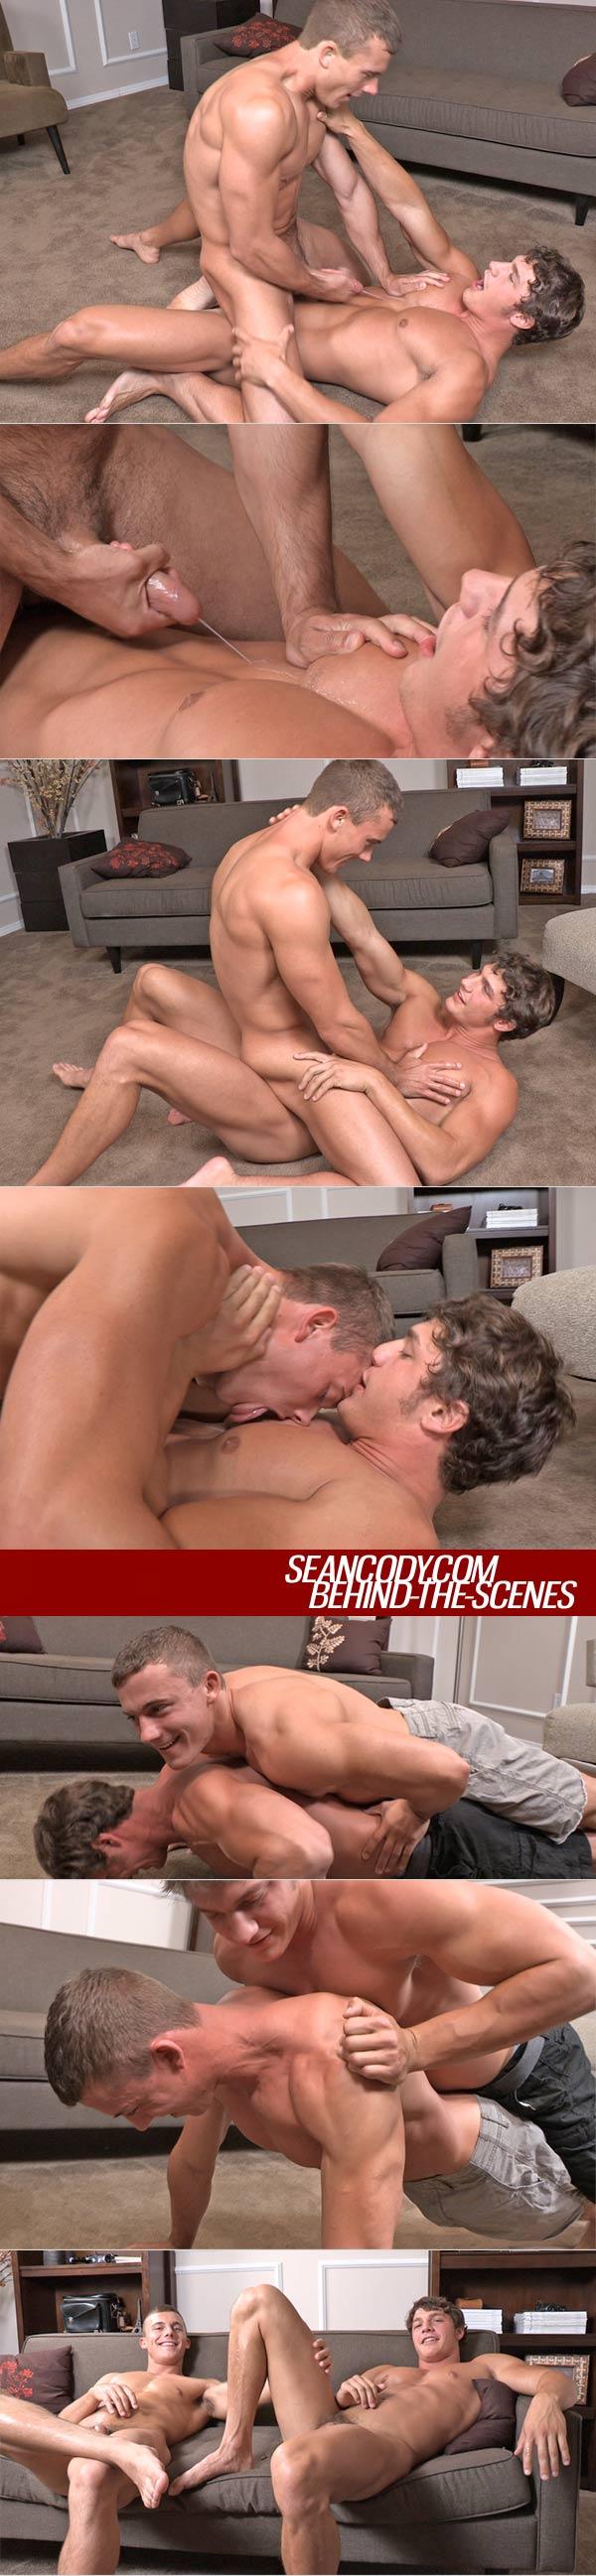 Joshua & Brandon (Bareback) at SeanCody